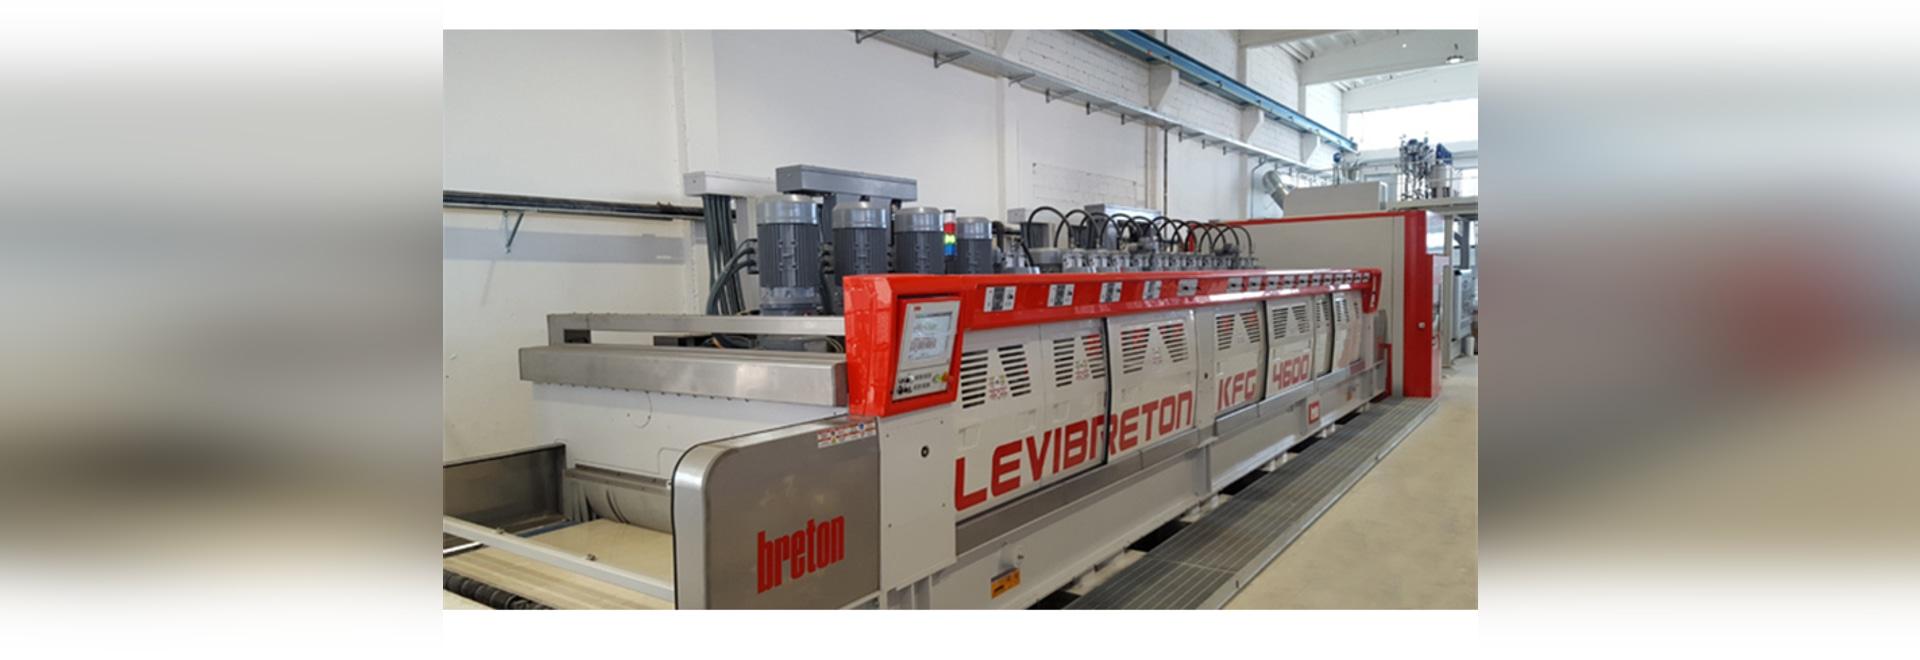 Marmi Bonazzo chooses the best solution to polish marble: the Levibreton KFG4600 line